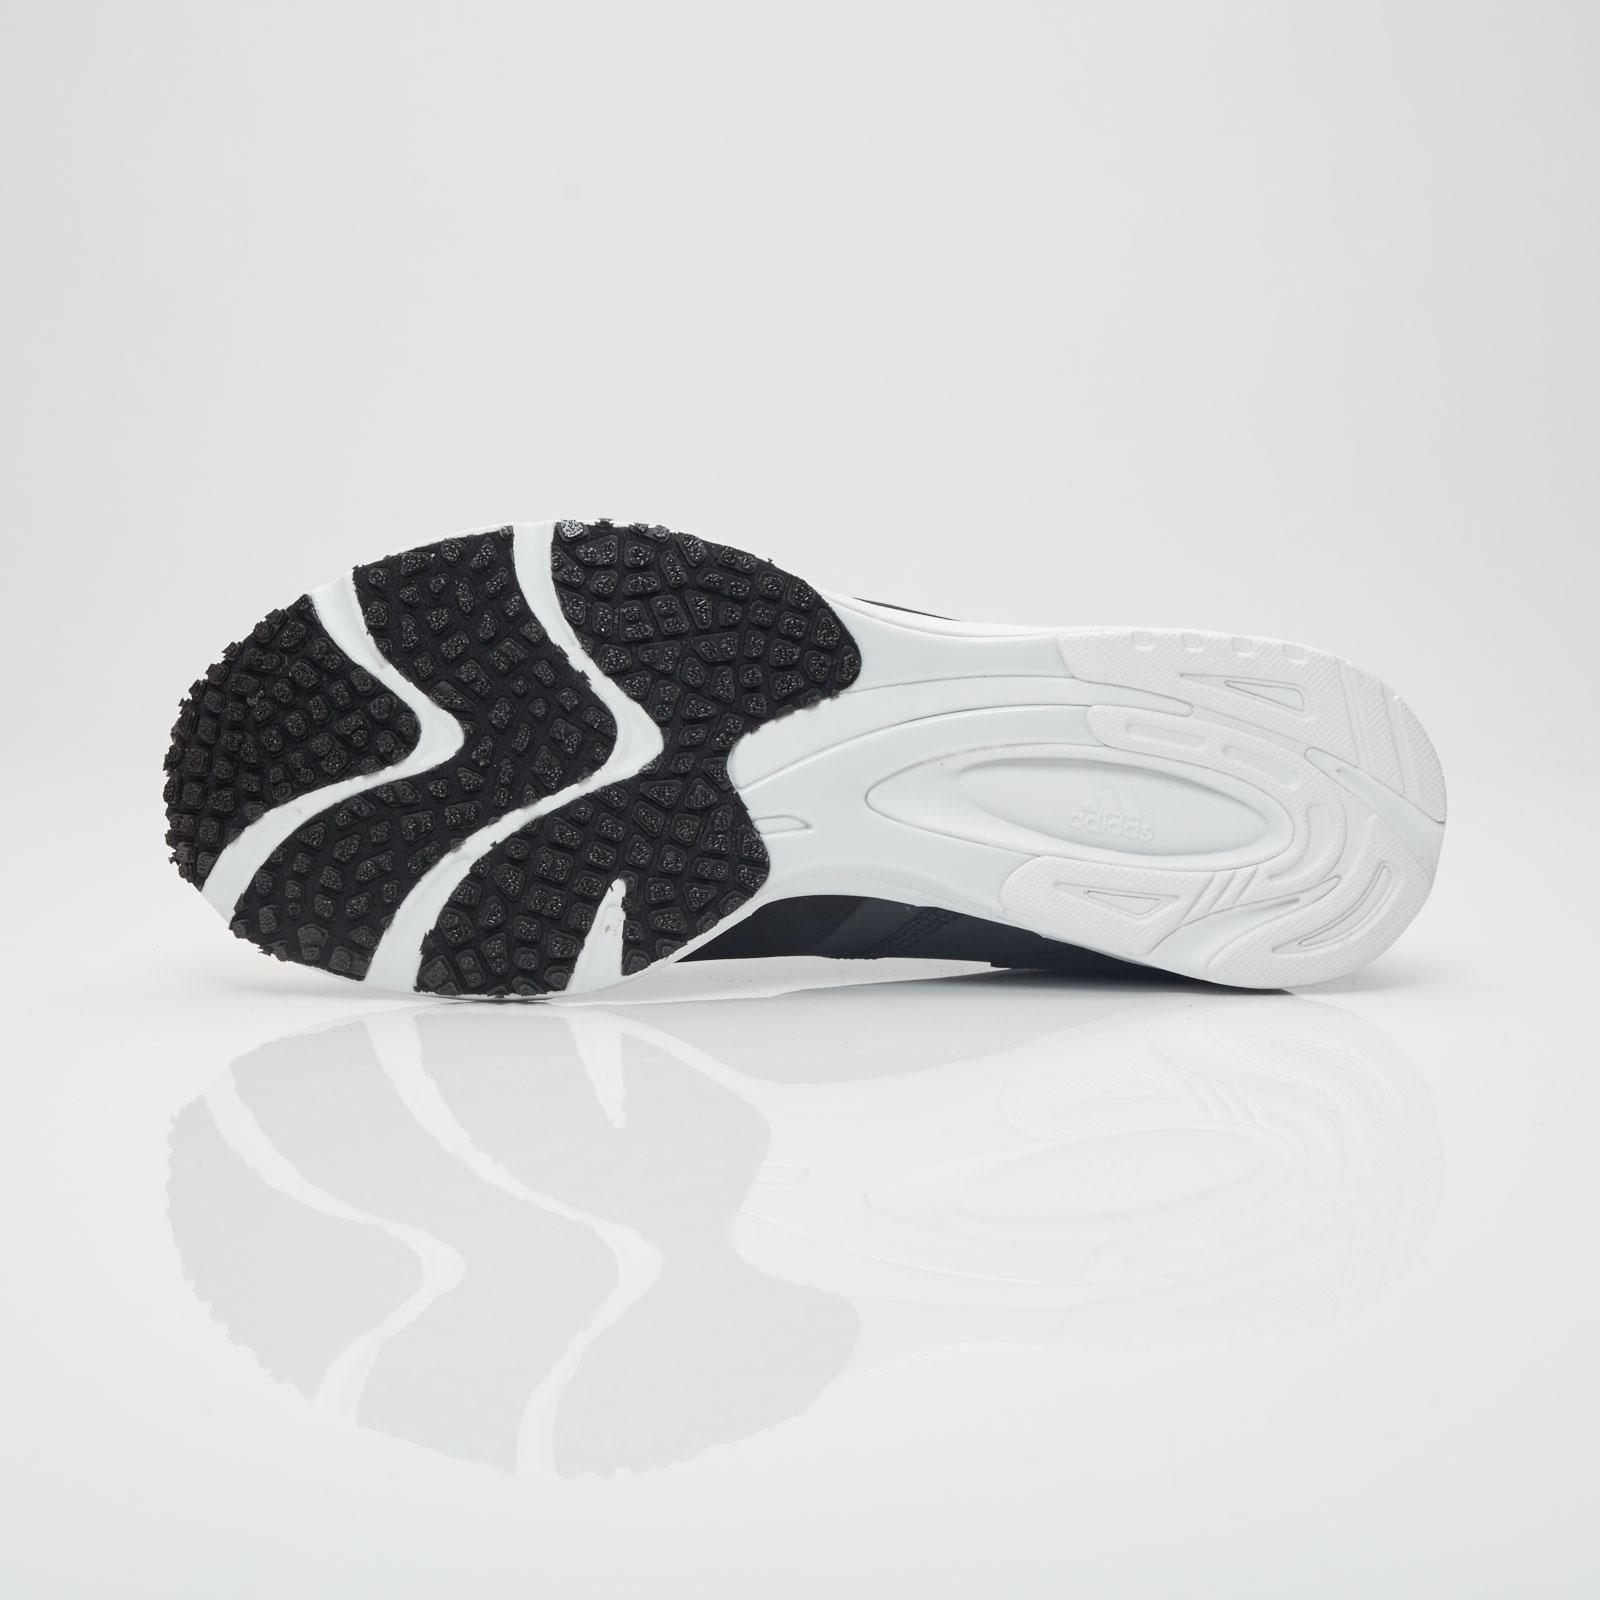 8cc35449acb7 adidas Arc RC - S77212 - Sneakersnstuff